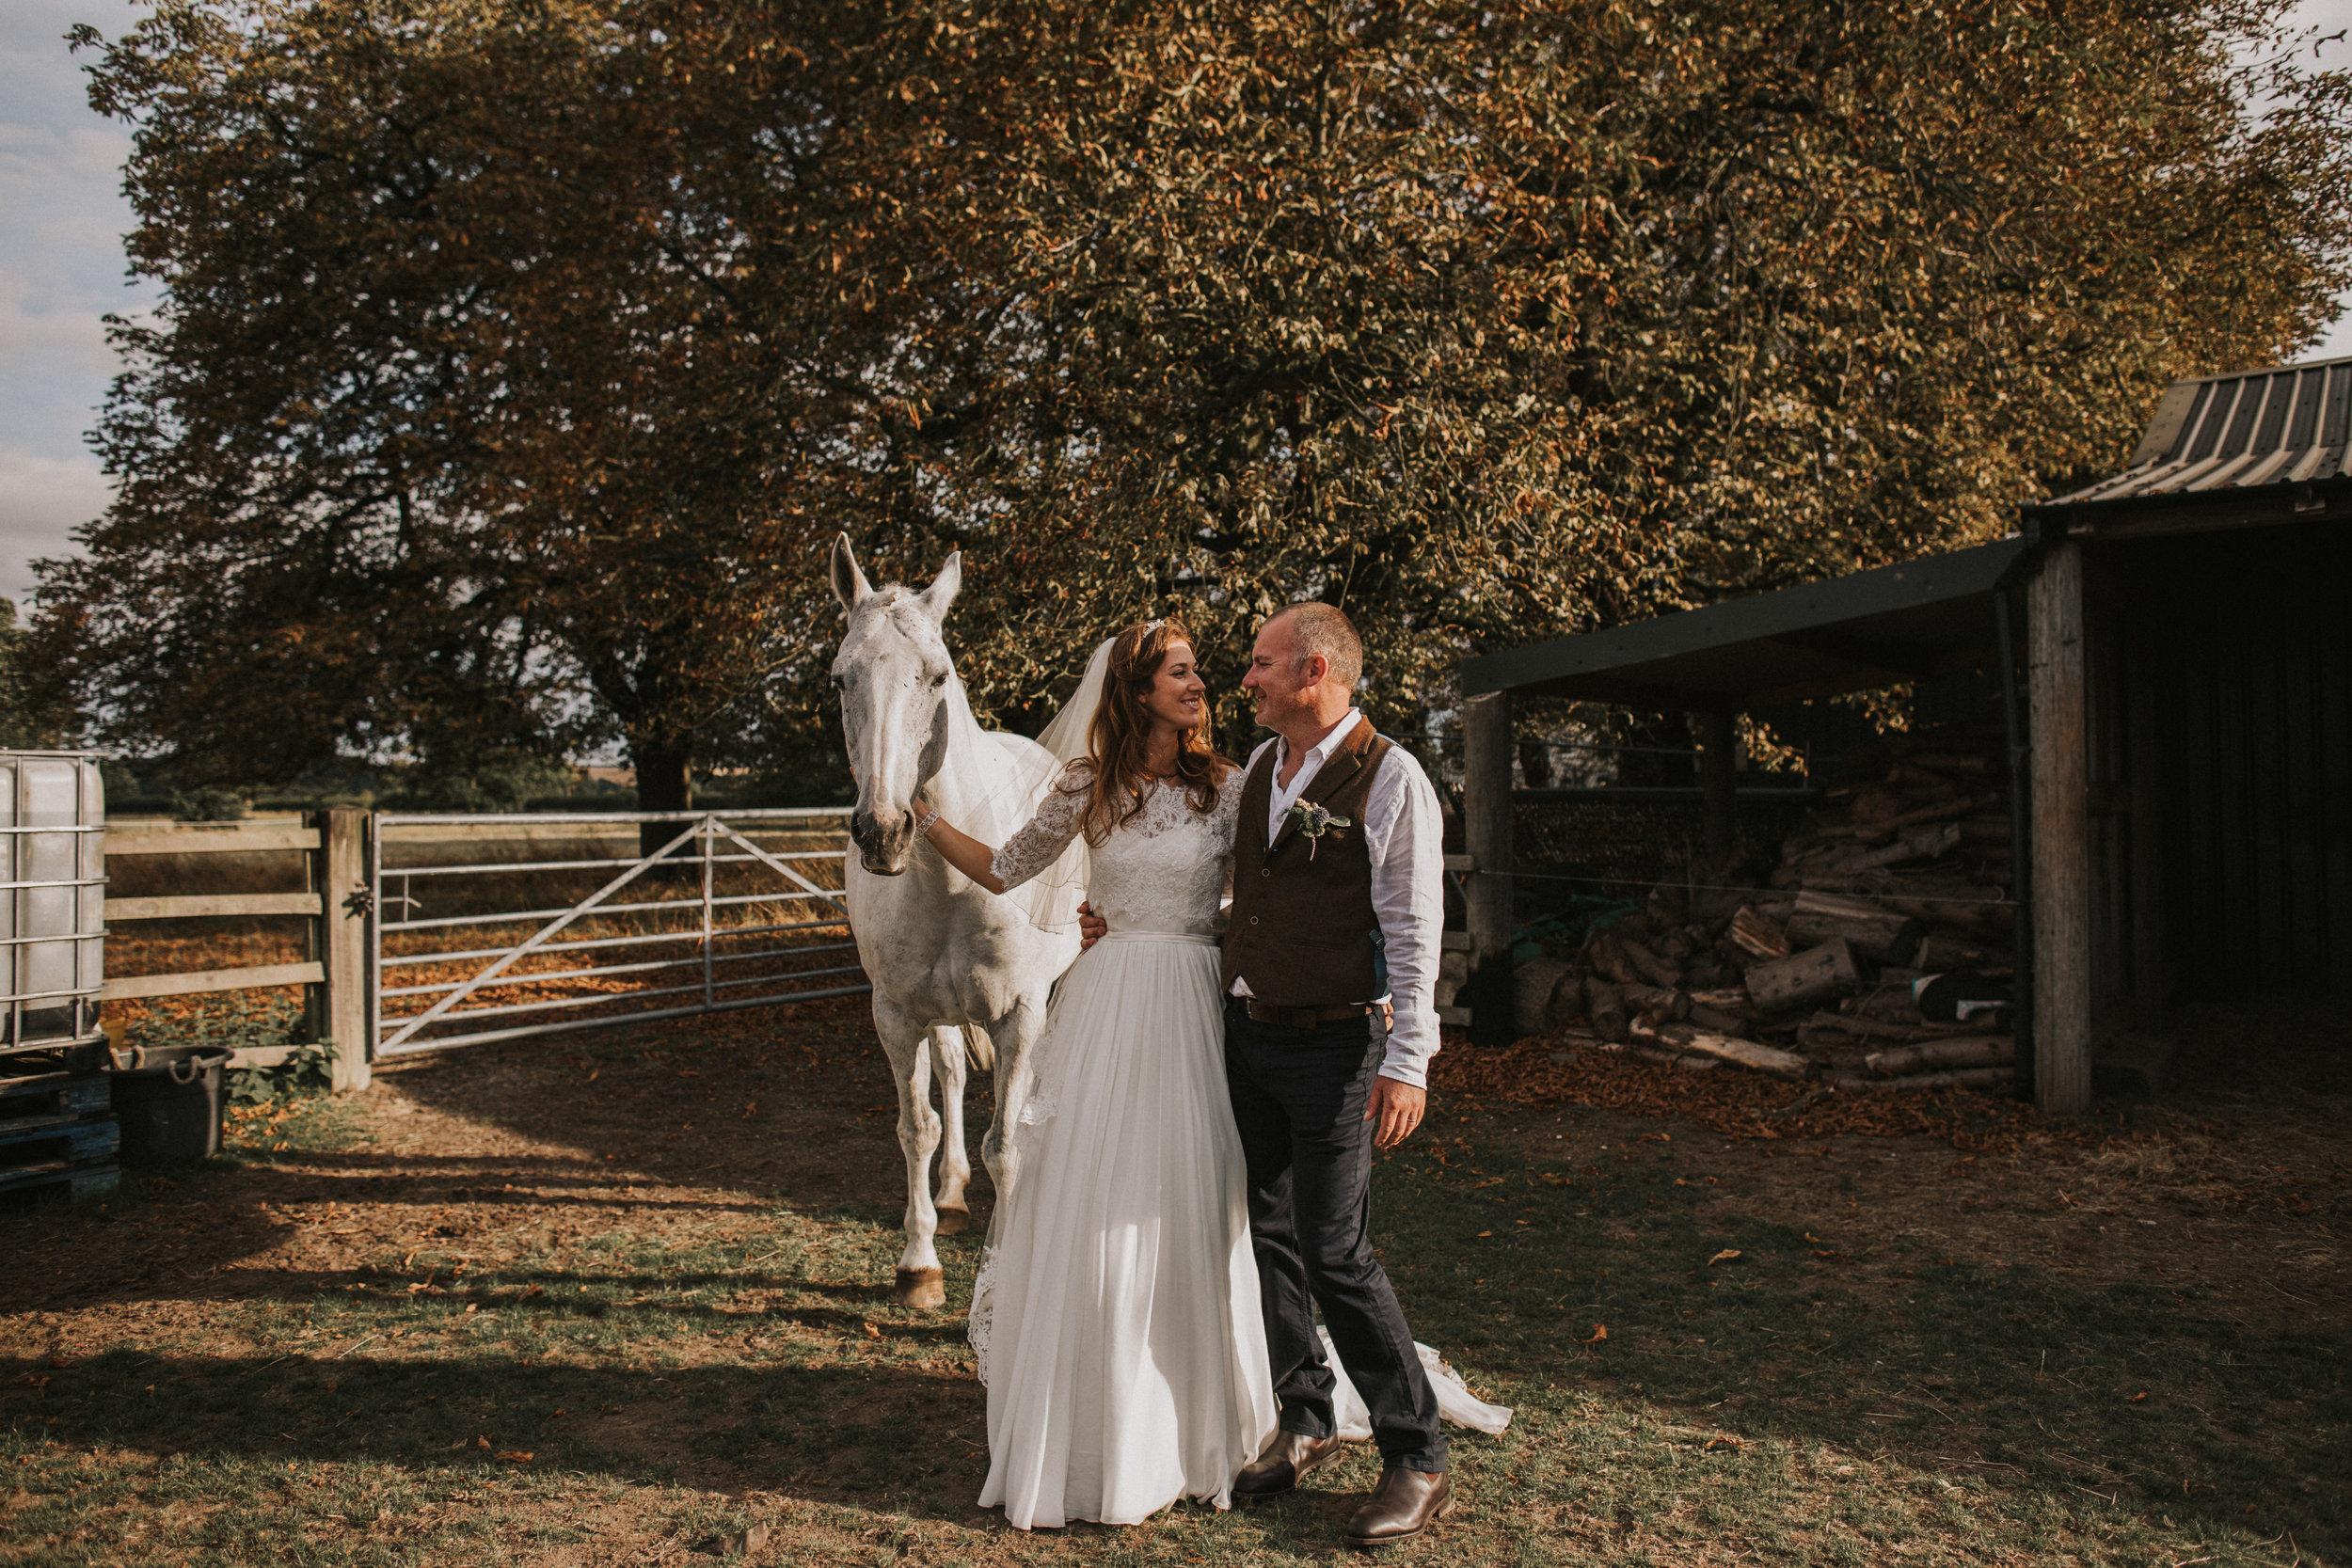 brook rose photography  Farm wedding_198.jpg